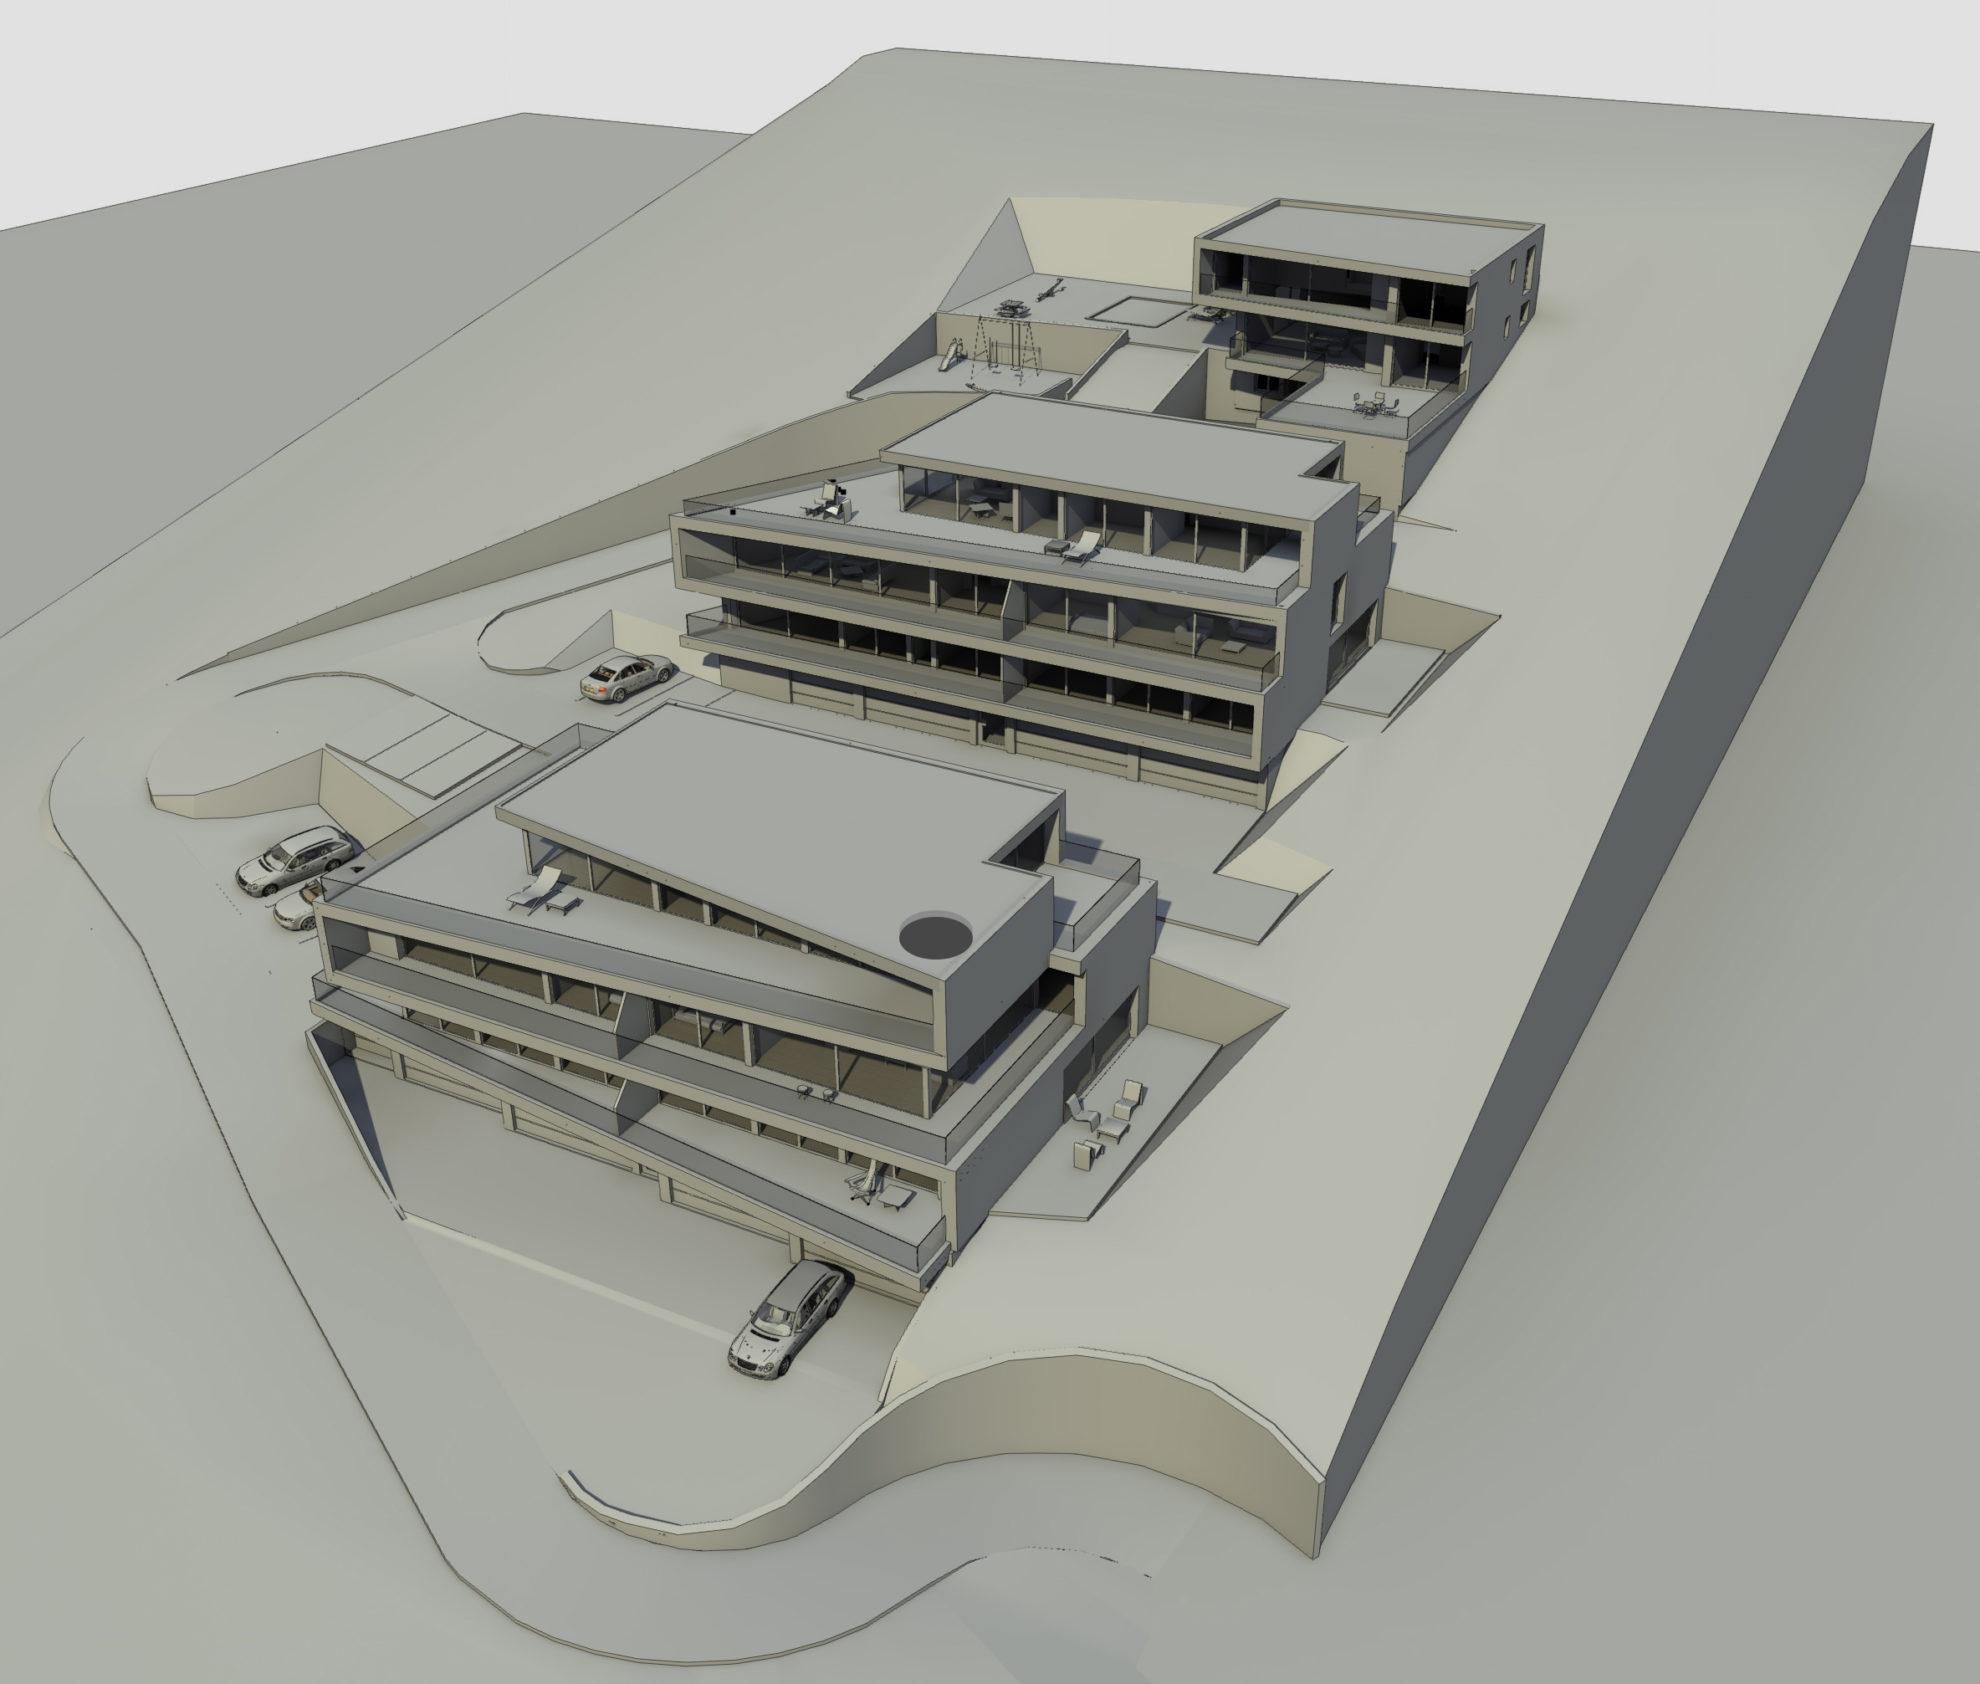 Ndërtesa banimi në Baden - Arbër Sadiki, Gëzim Sadiku